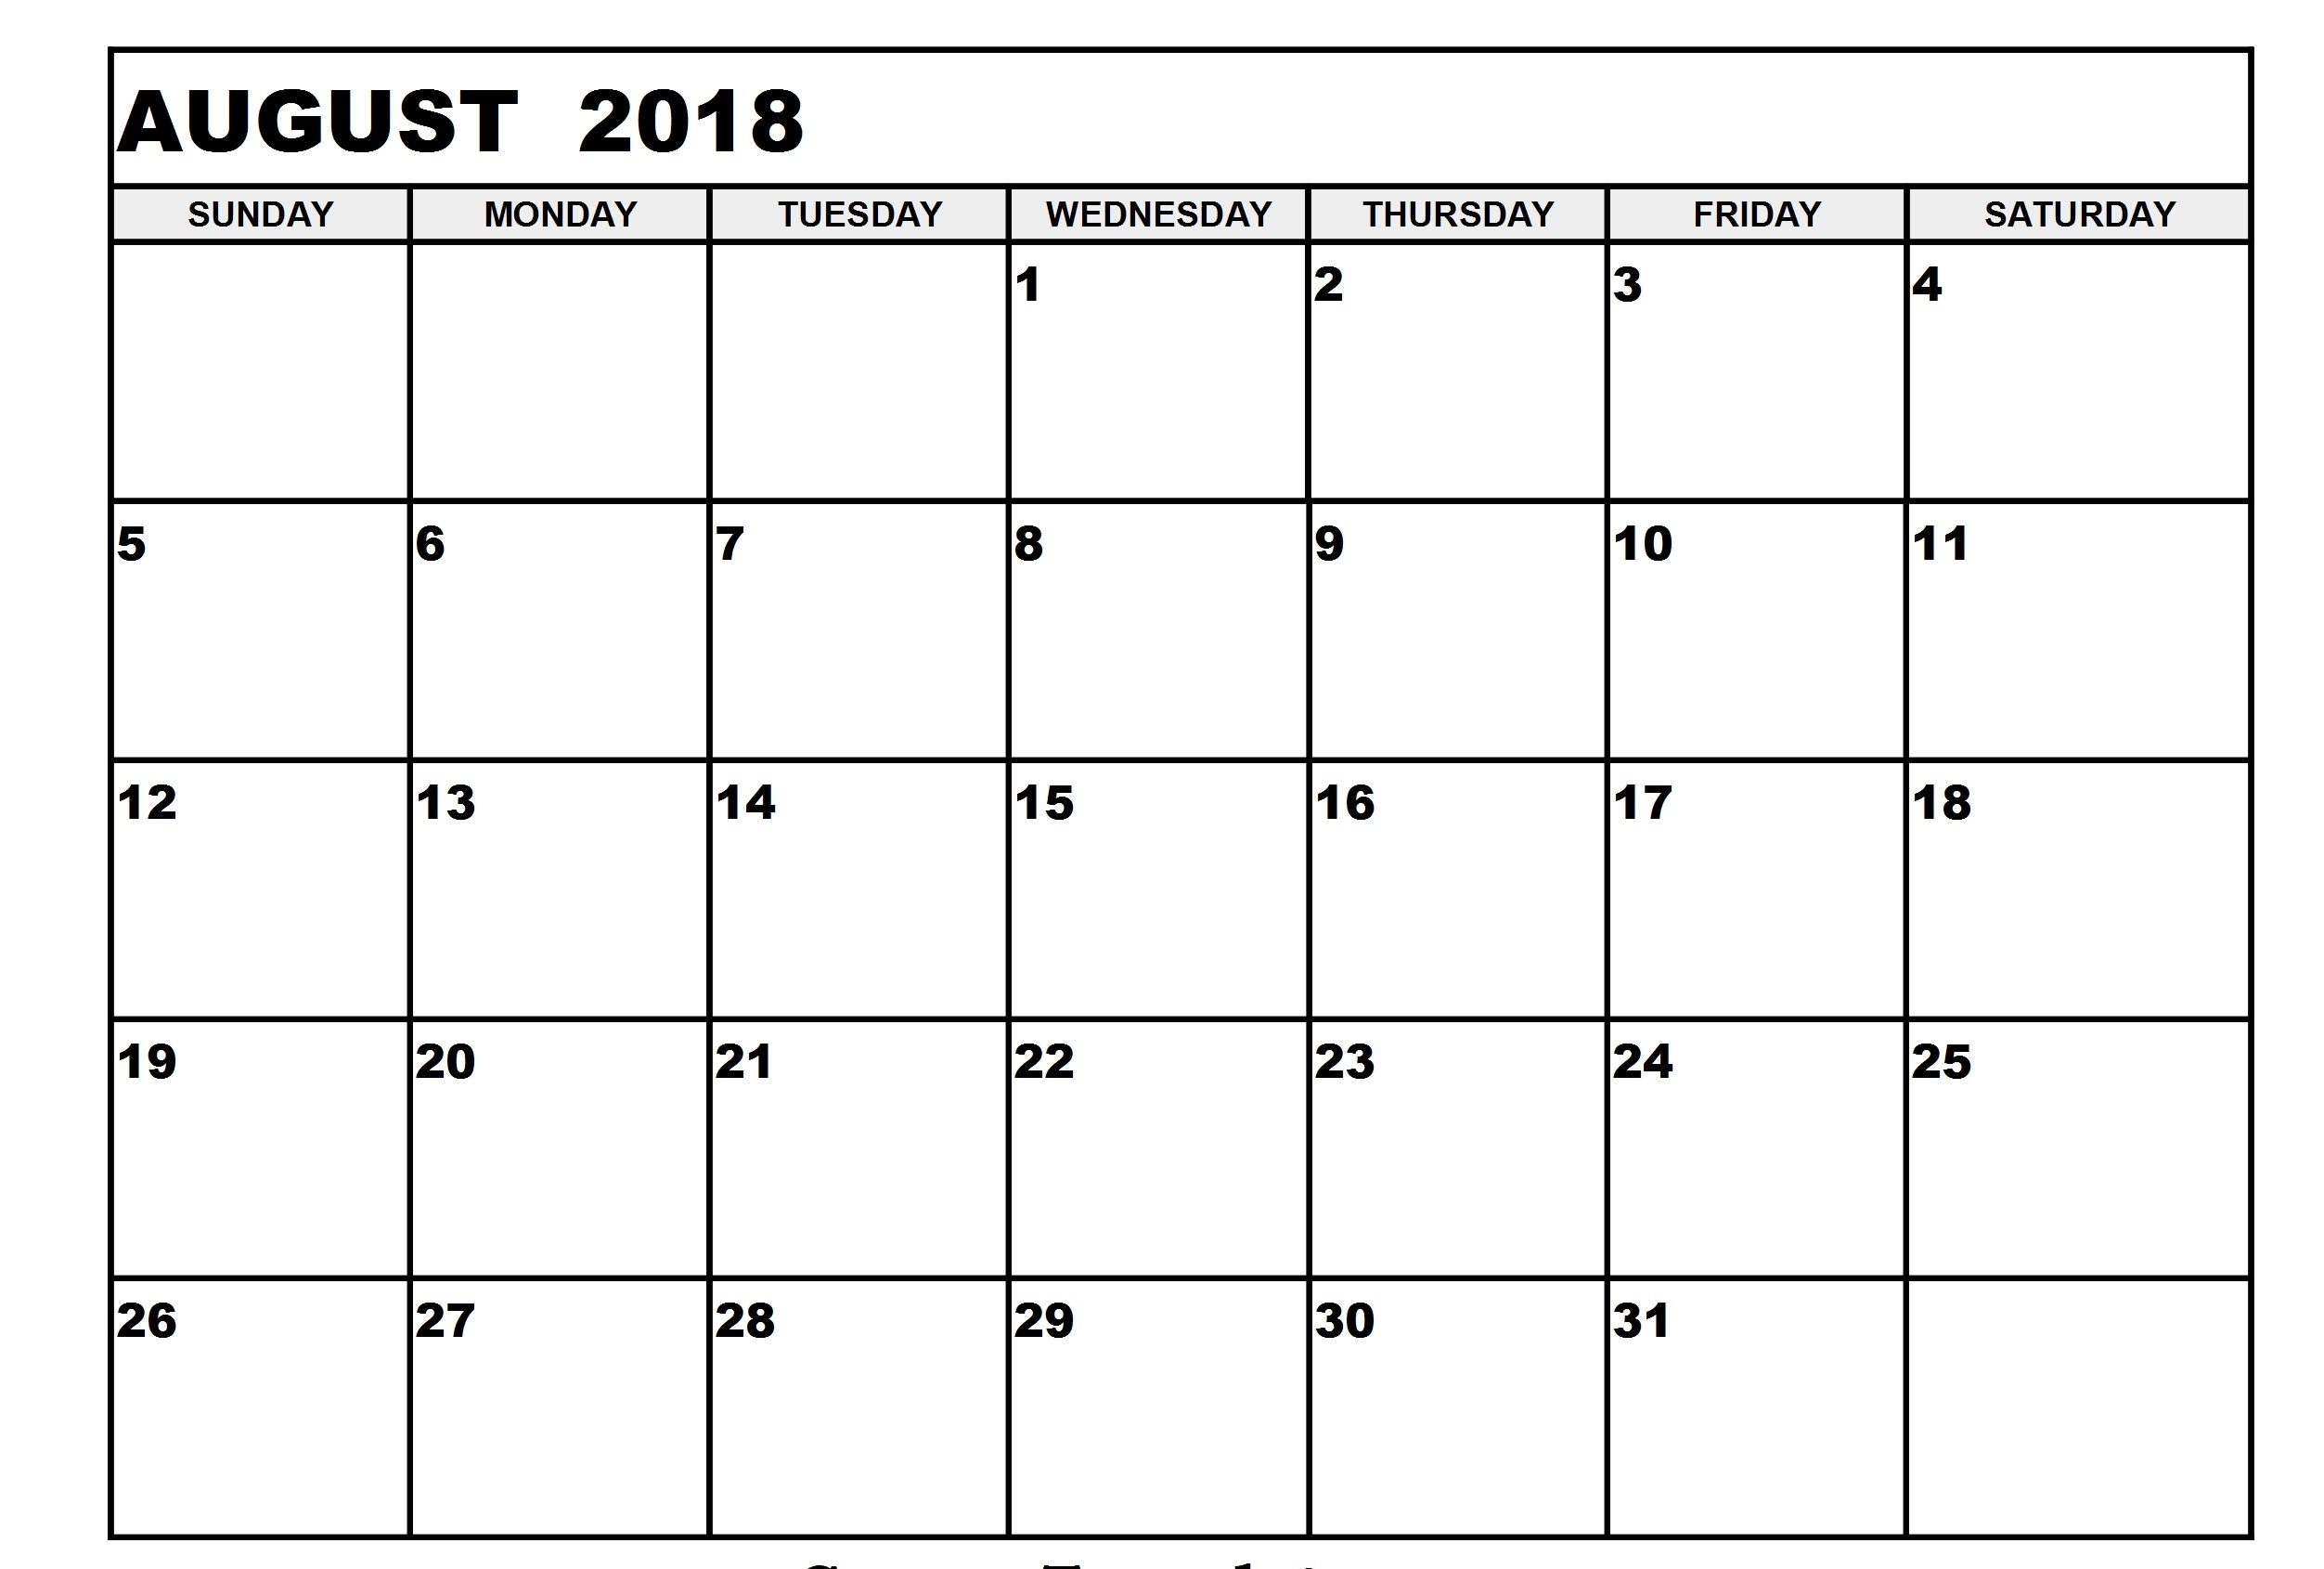 August 2018 Printable Calendar | Business Calendar Templates for Cute Printable August Calendar Template